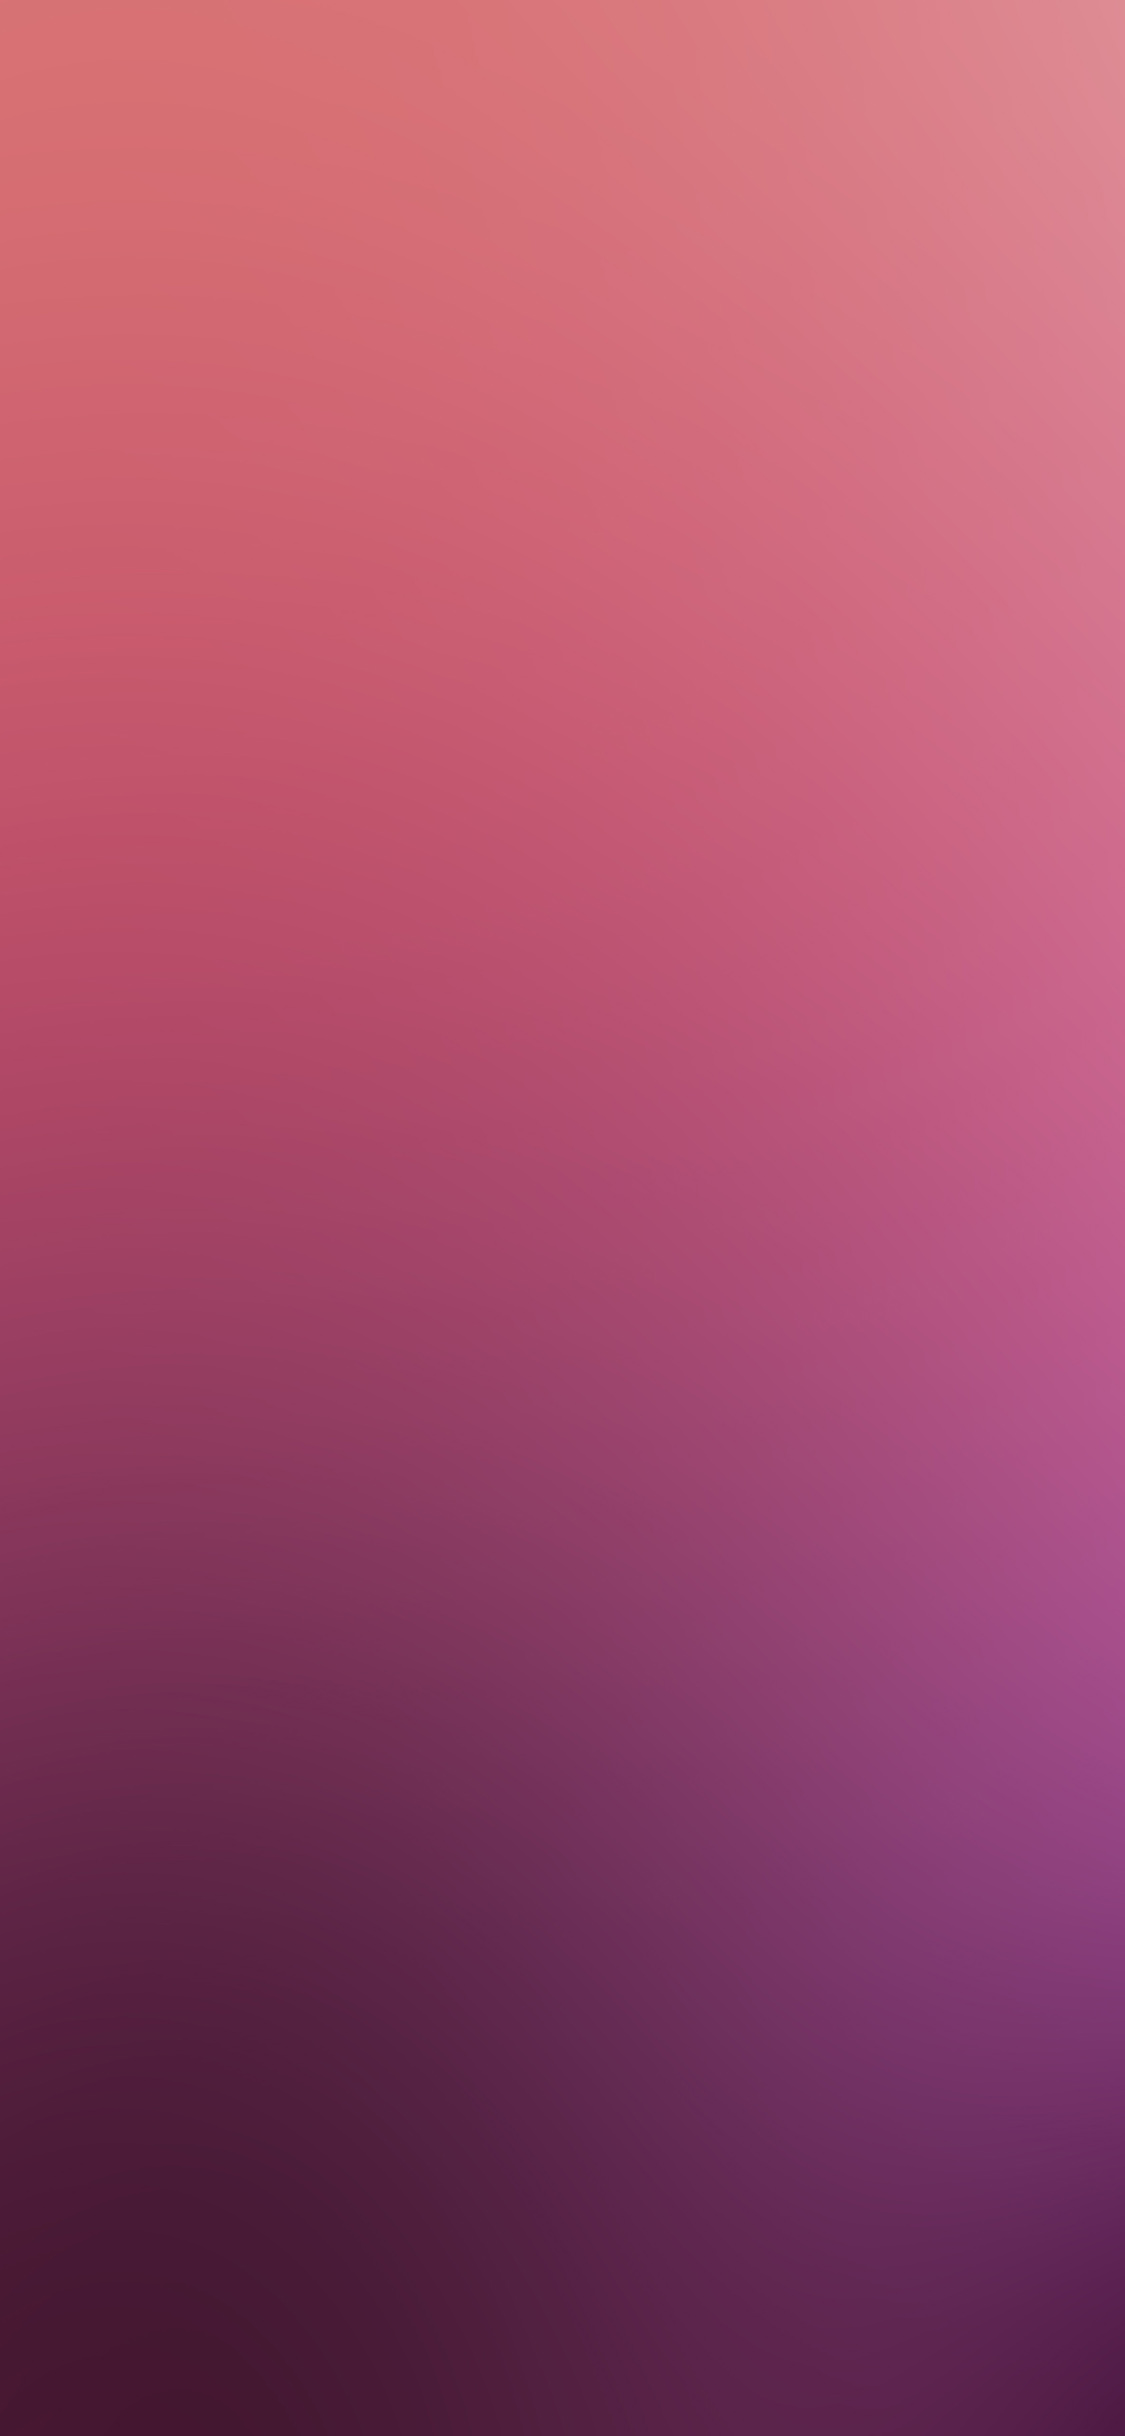 iPhoneXpapers.com-Apple-iPhone-wallpaper-sf78-burning-fire-soft-healing-gradation-blur